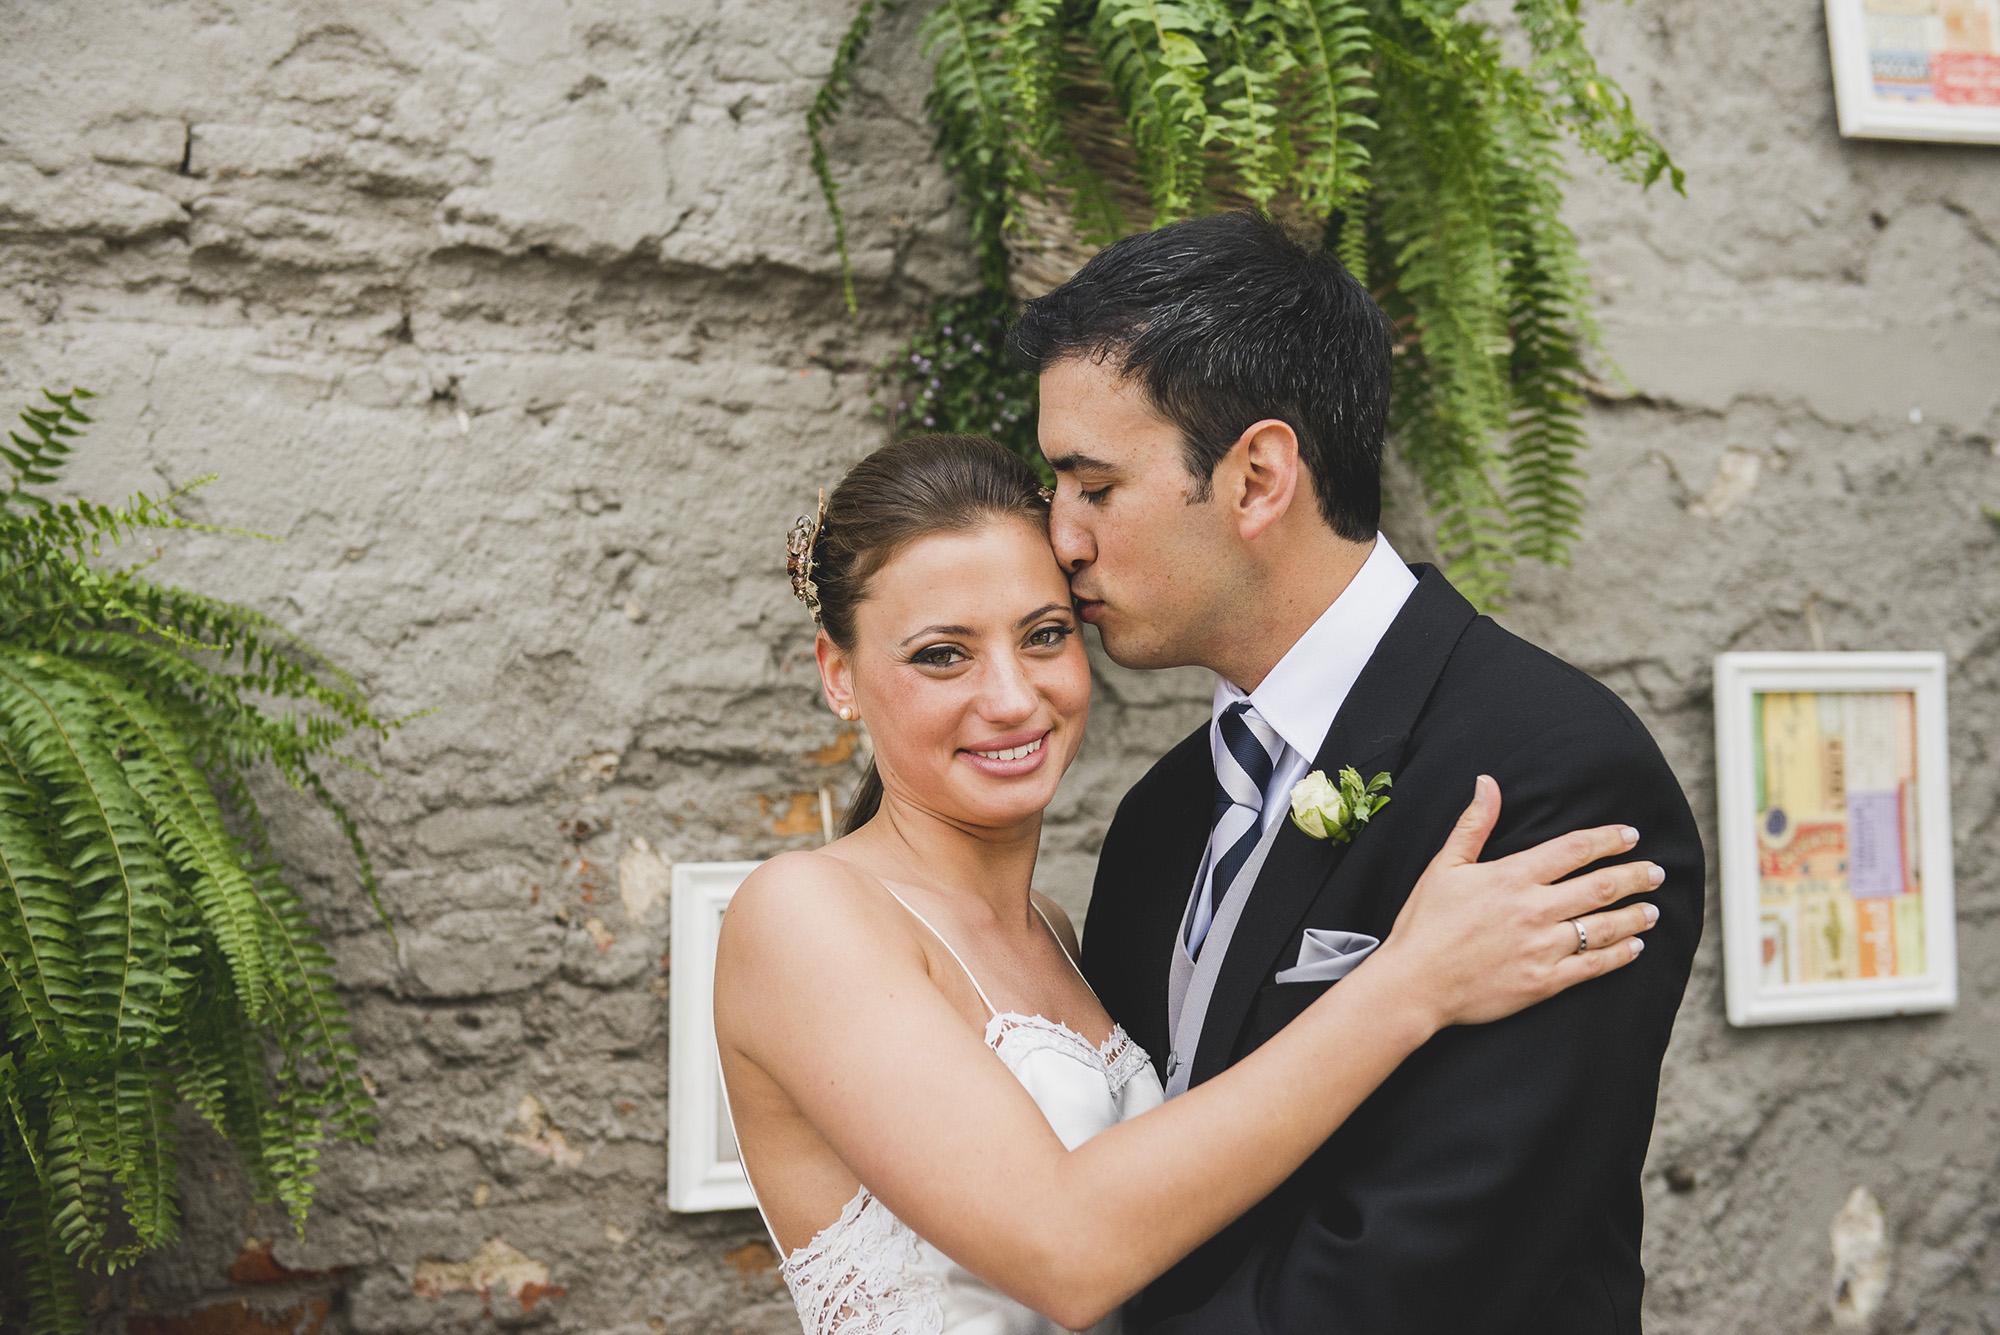 patricia-riba-casamiento-montevideo-uruguay-lindolfo-50